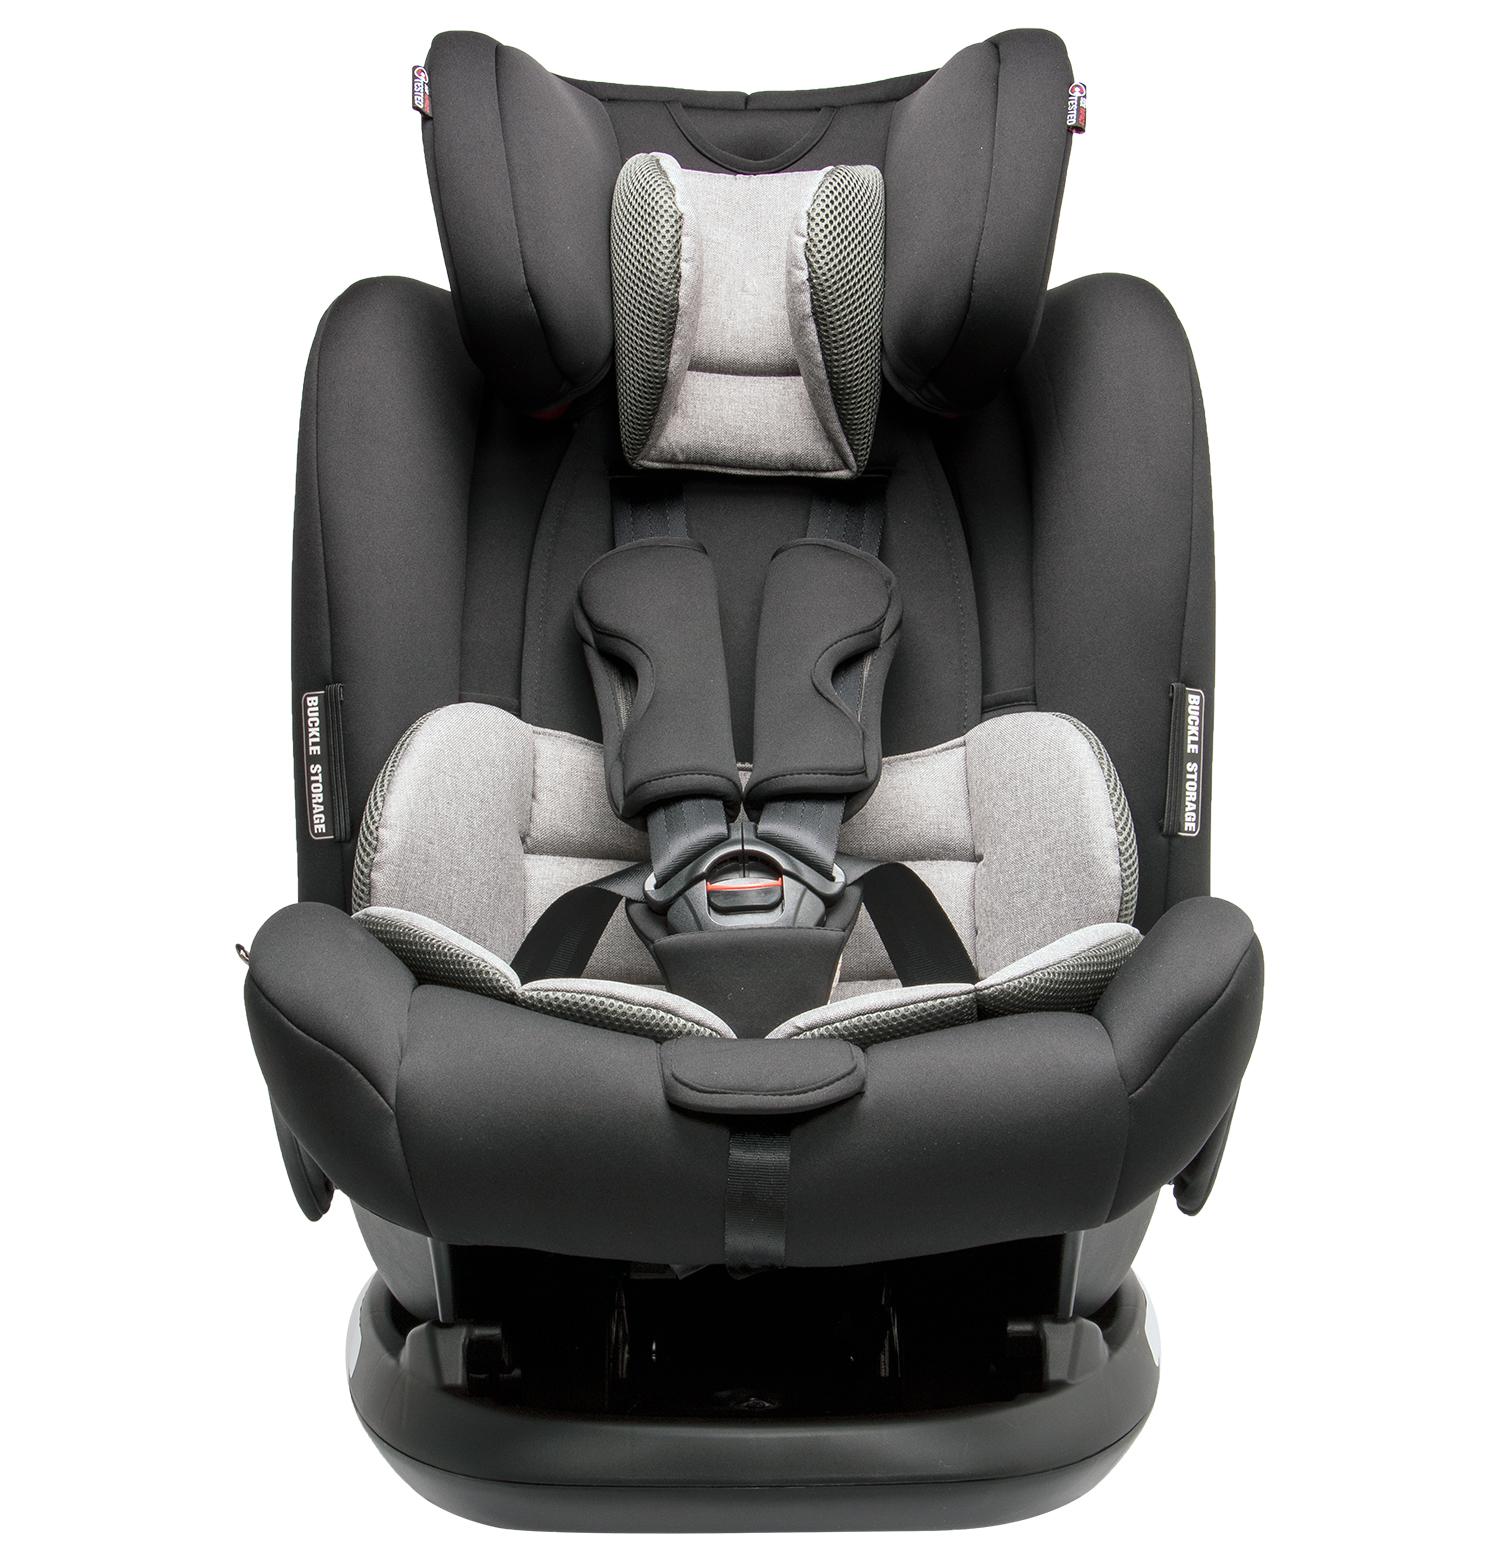 Bonbijou Easy Rider 2020 Car Seat